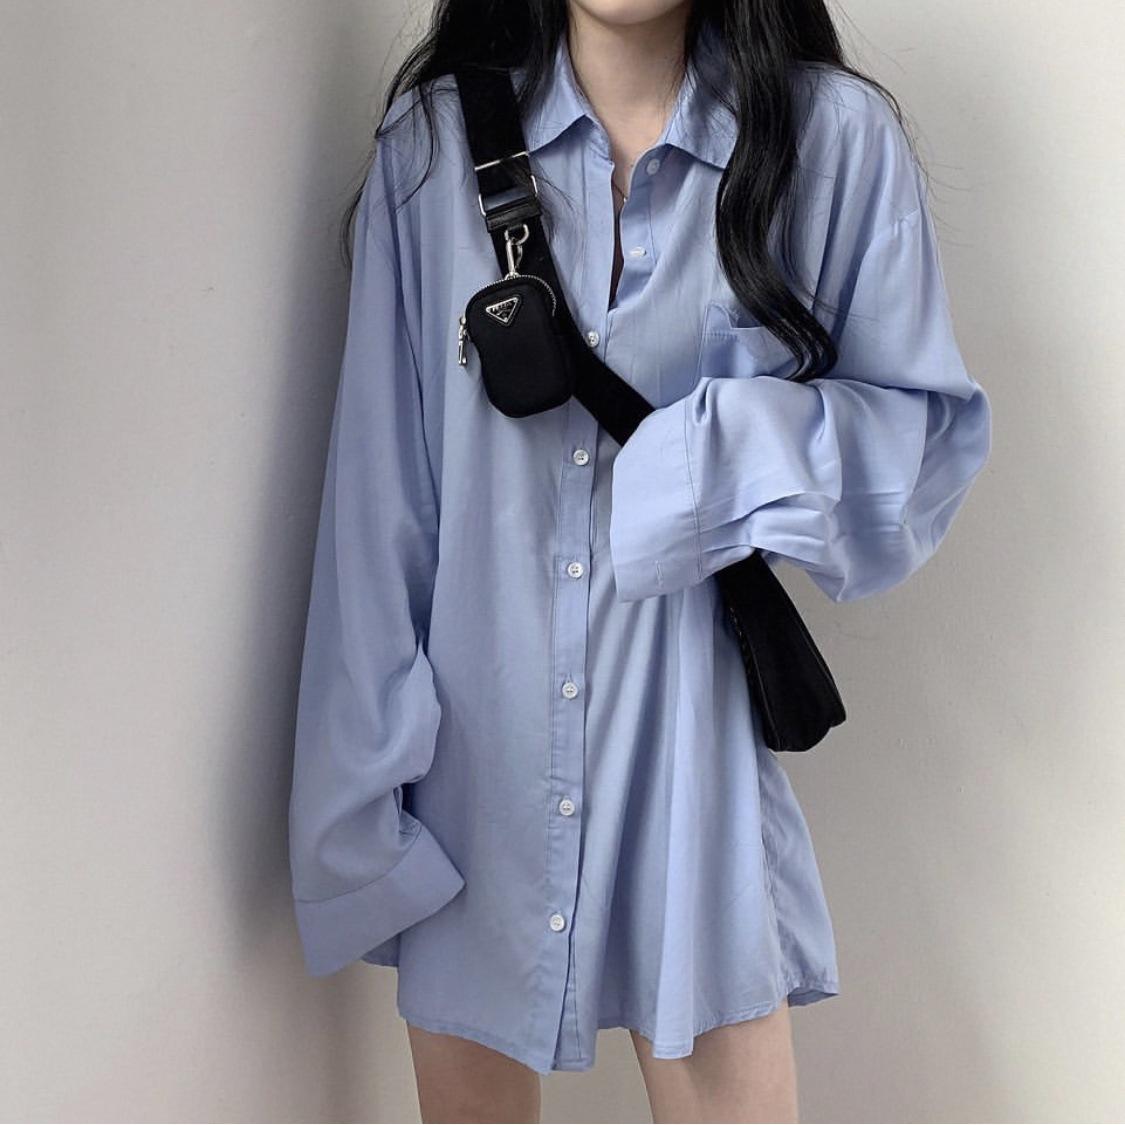 2020 loose shirt female Korean style chic sunscreen silky fall feeling sunscreen long-sleeved mid-le